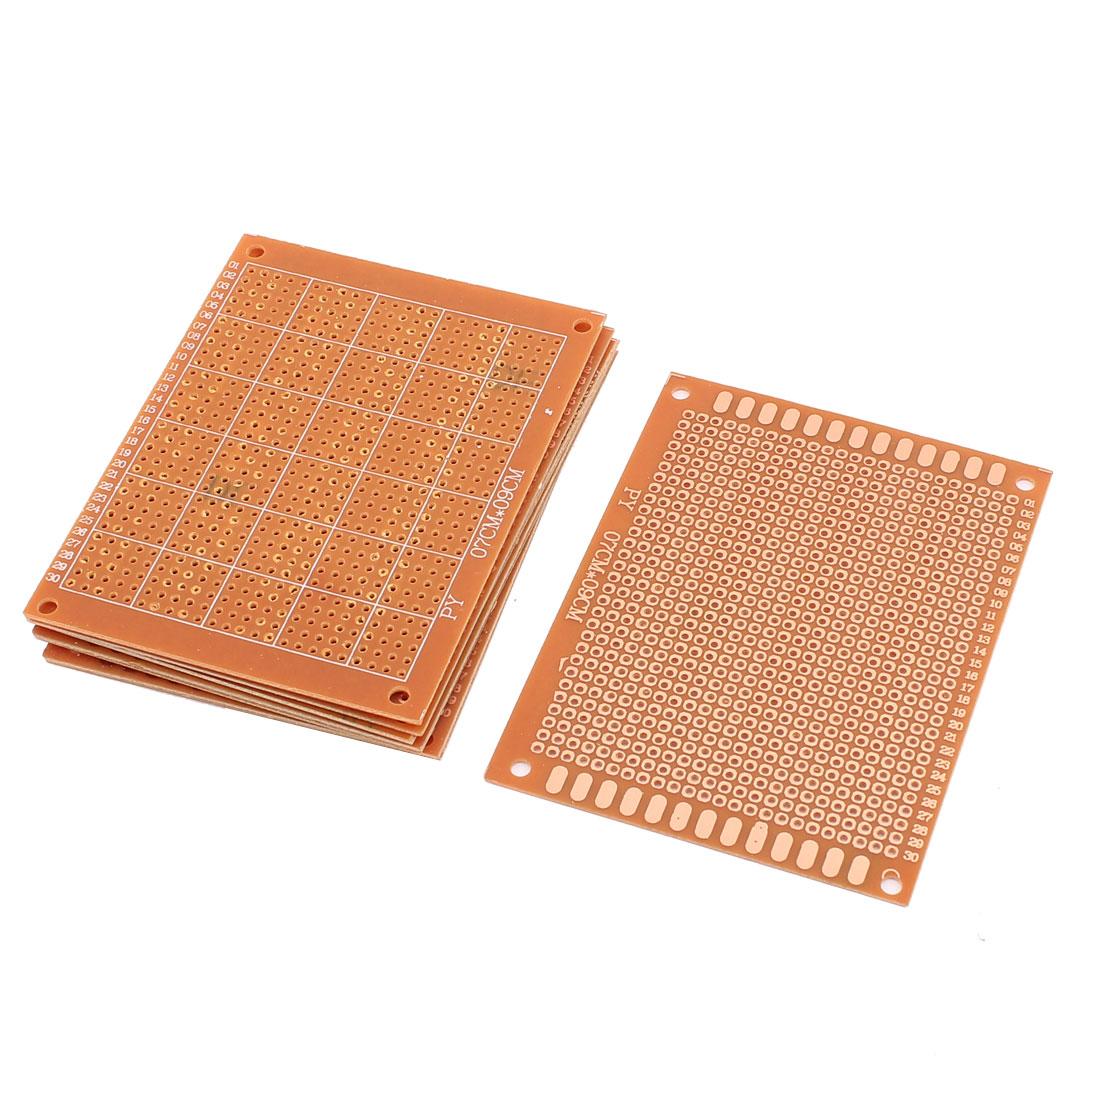 9 x 7cm Copper Universal Single-Sided Soldering Stripboard PCB Board 8pcs